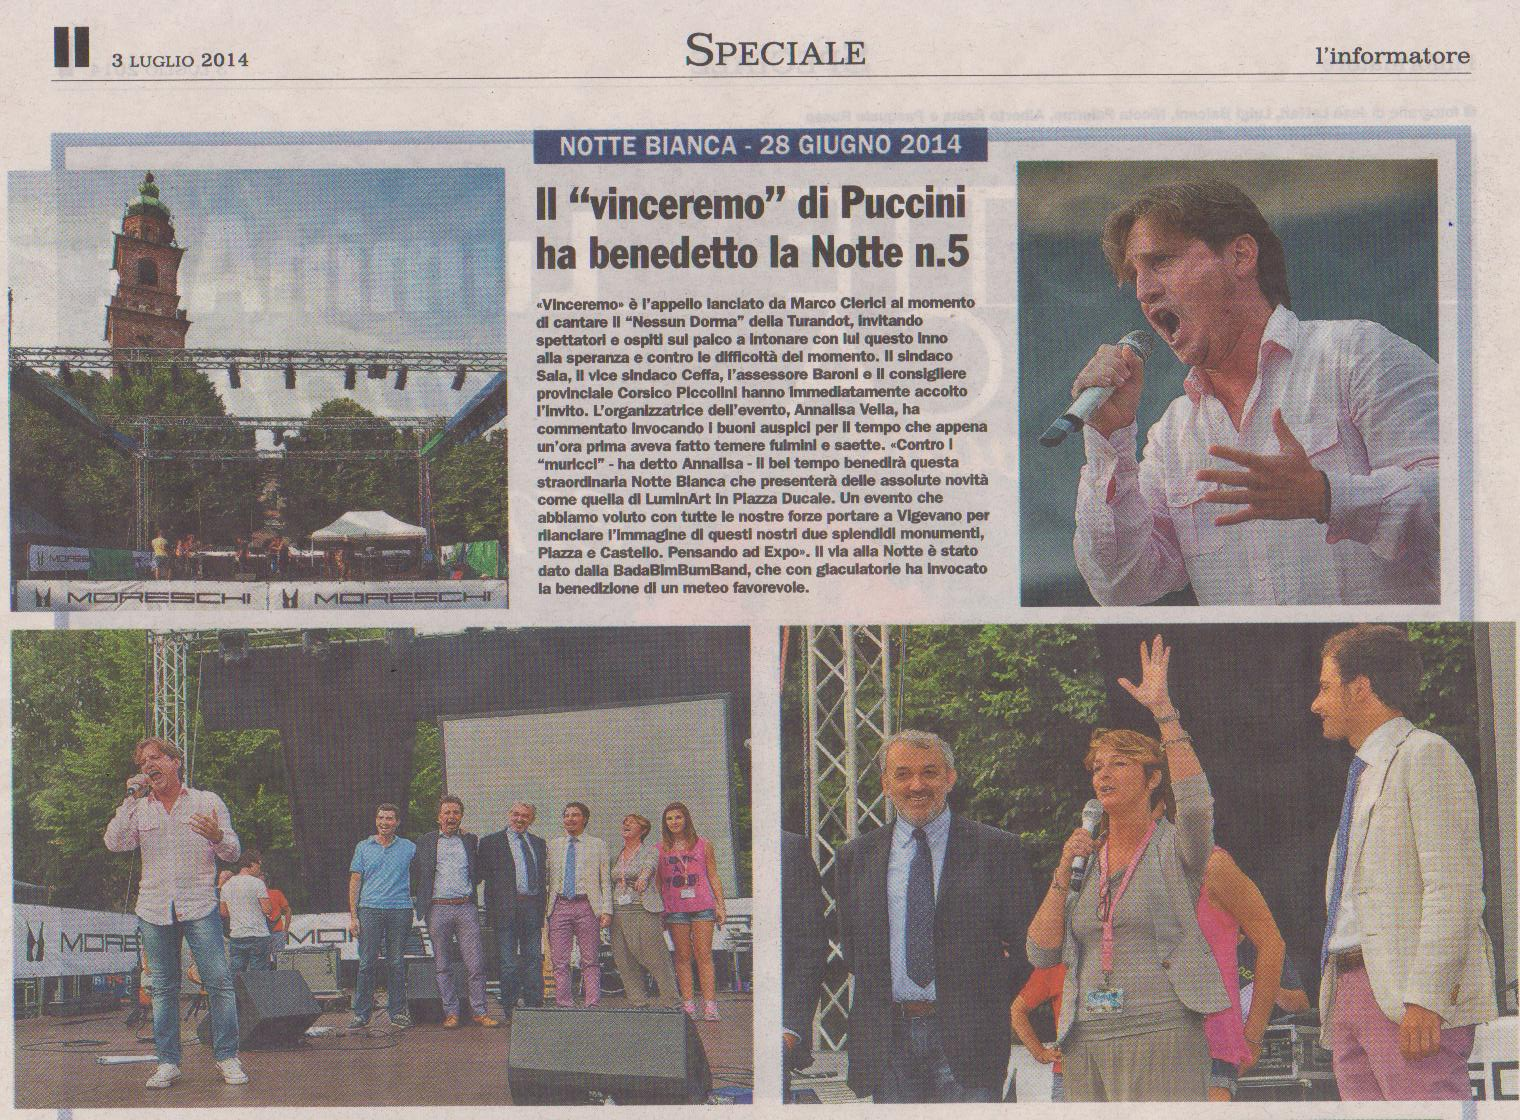 Marco Clerici alla Notte Bianca di Vigevano 2014